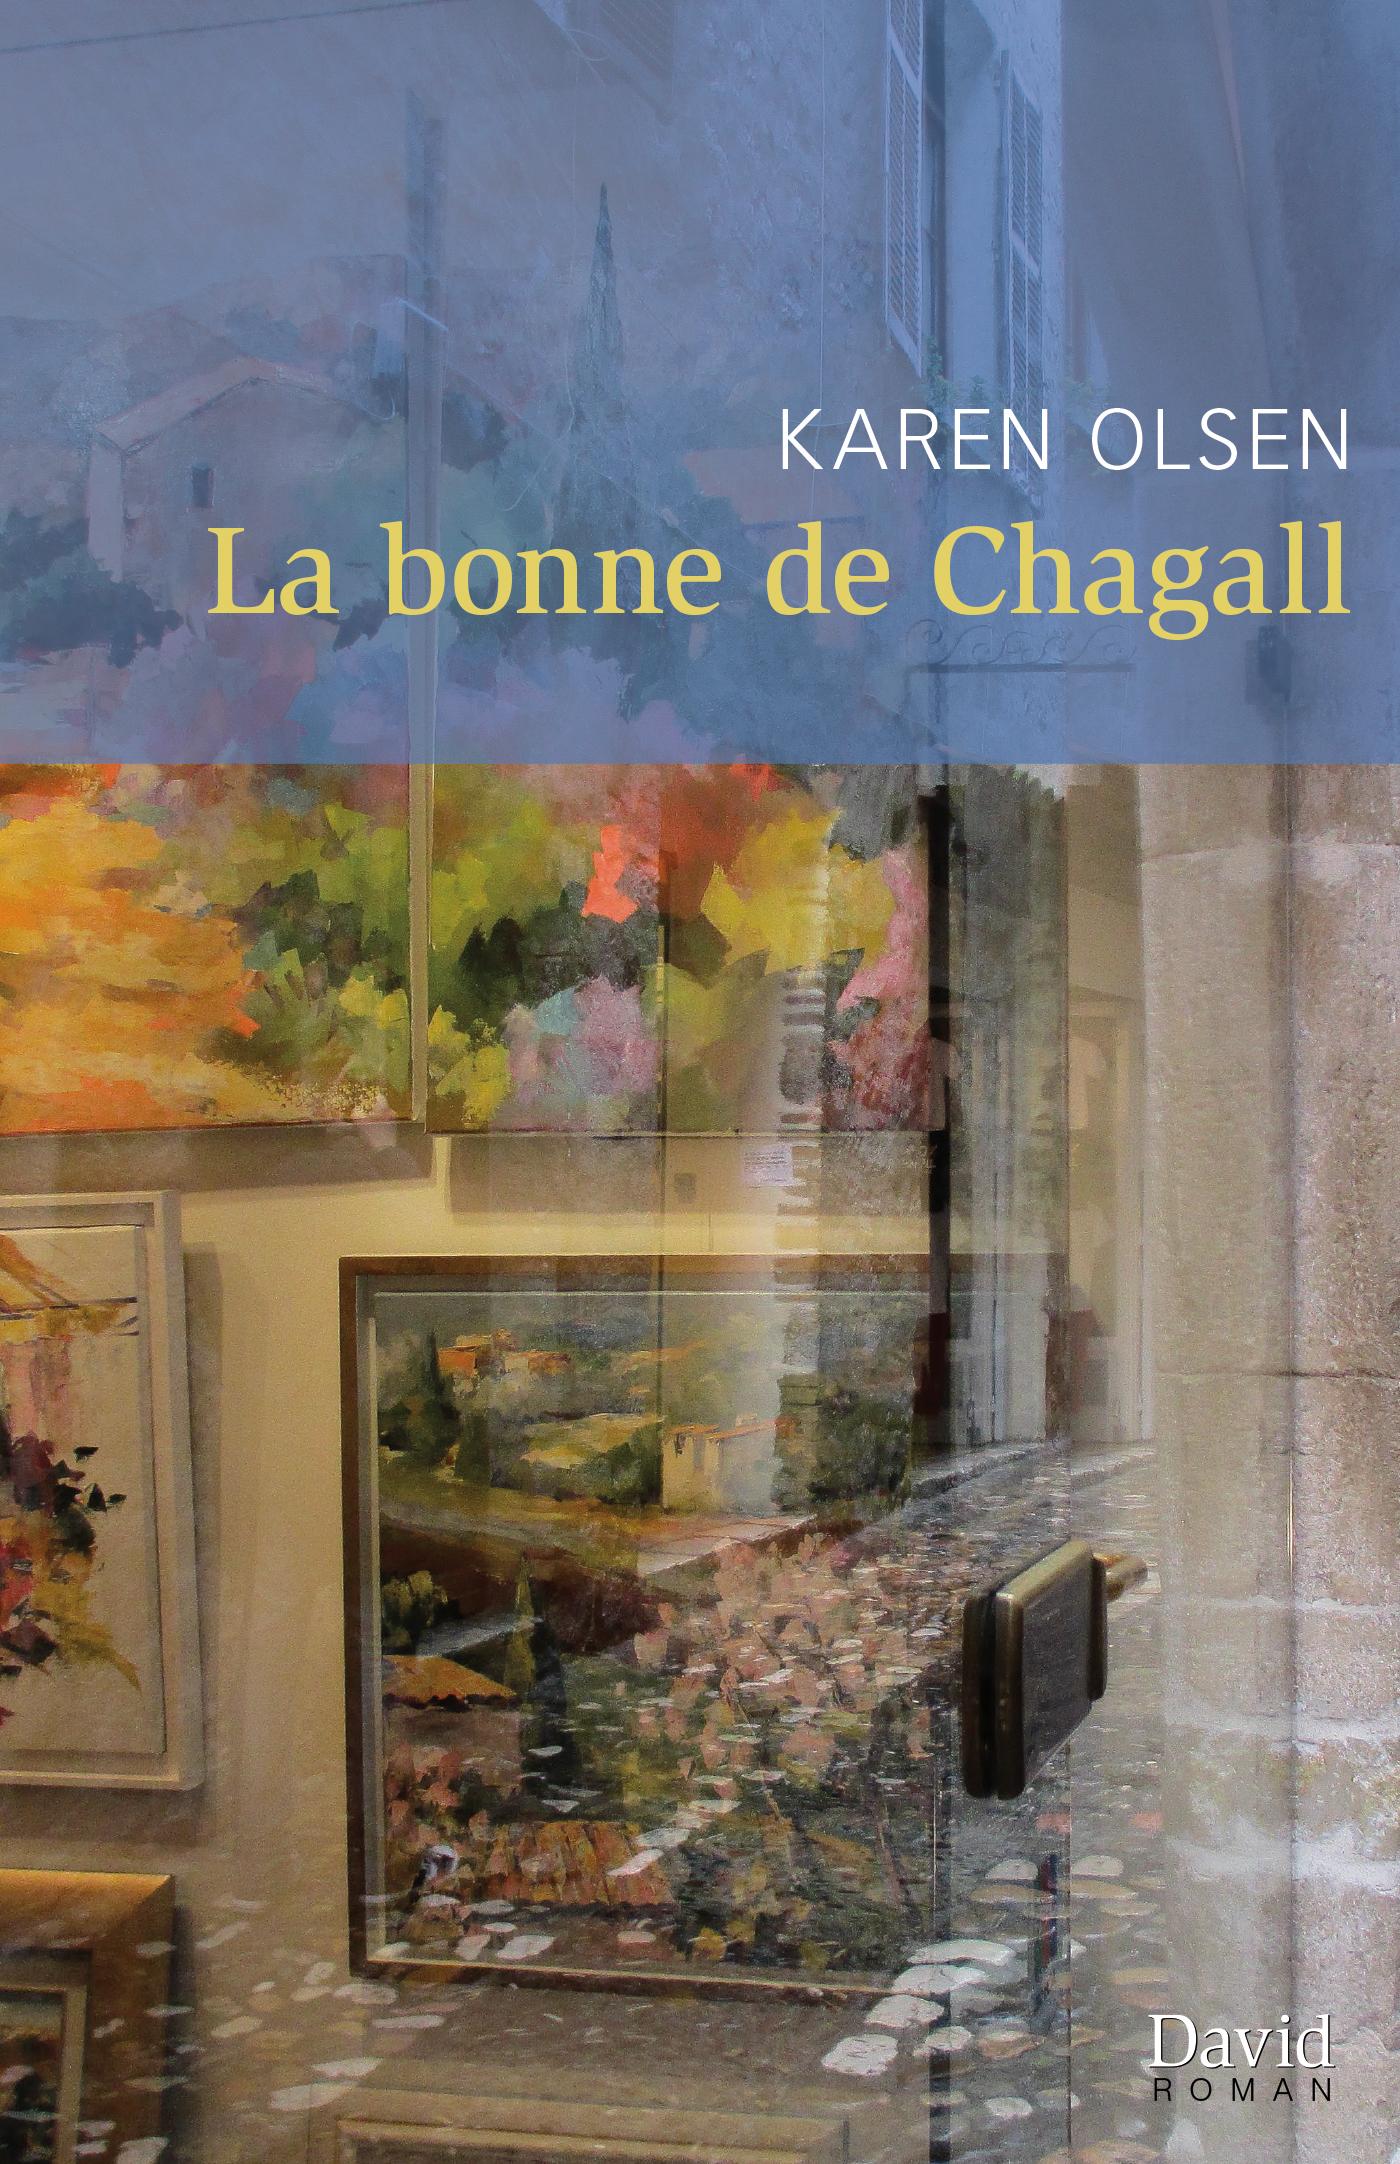 La bonne de Chagall